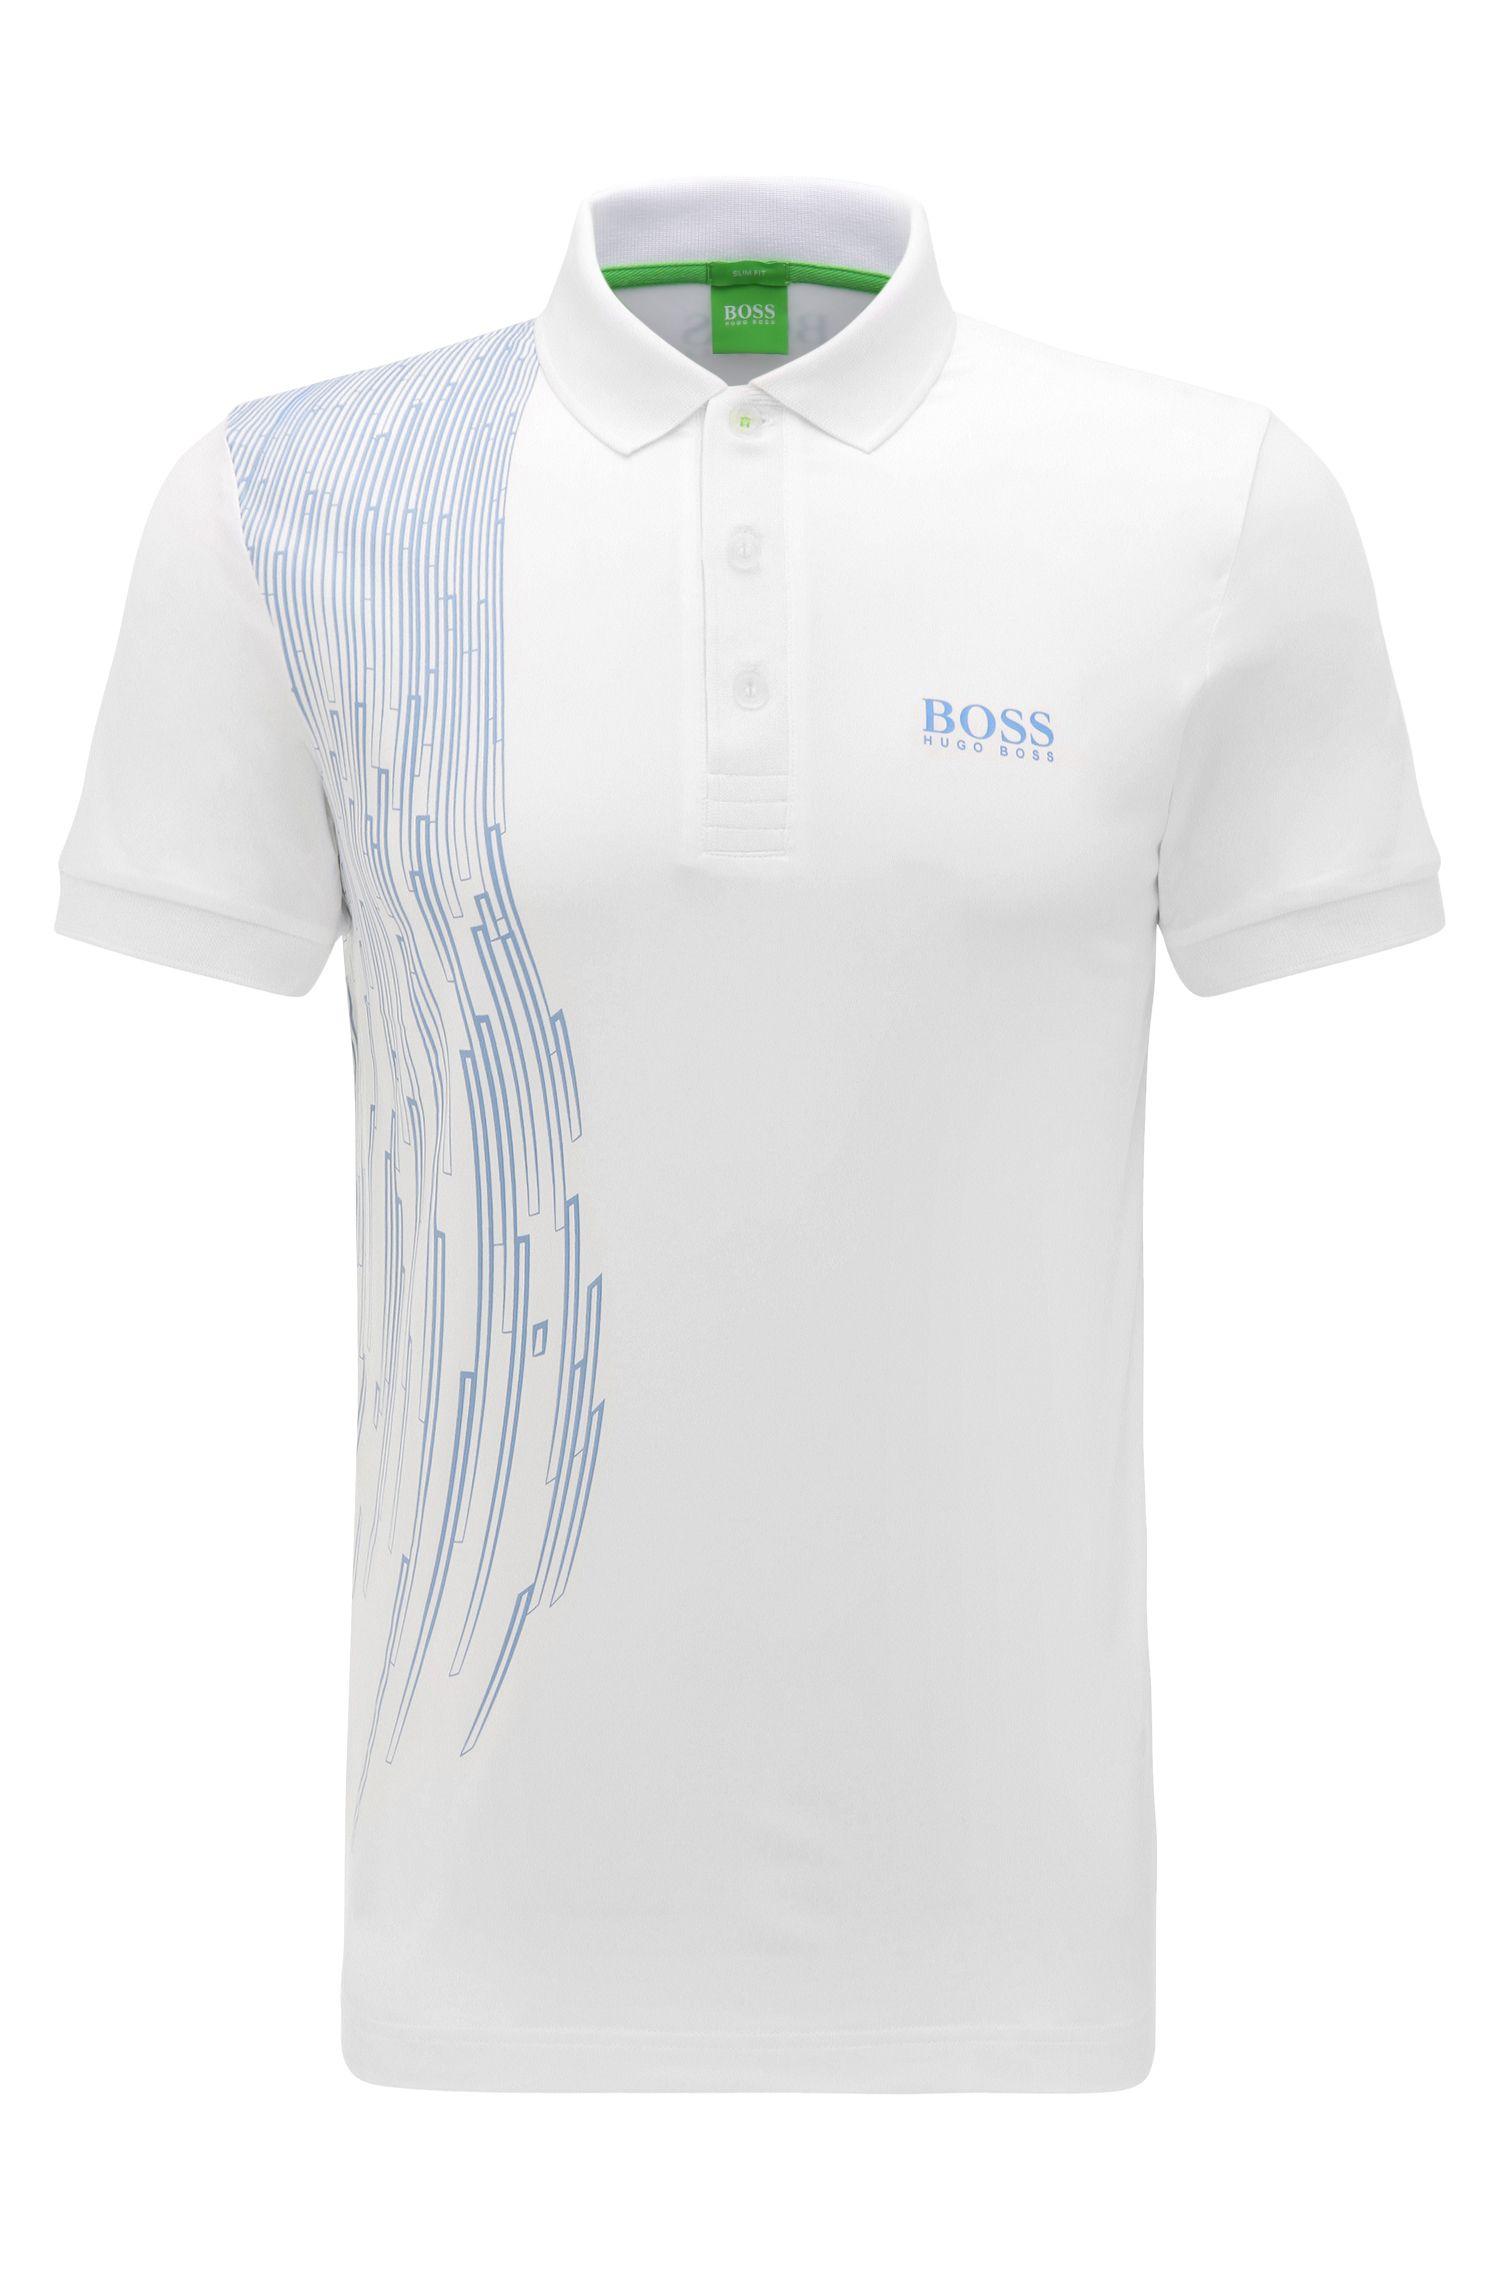 'Paule Pro 3'   Slim Fit, Printed Polo Shirt